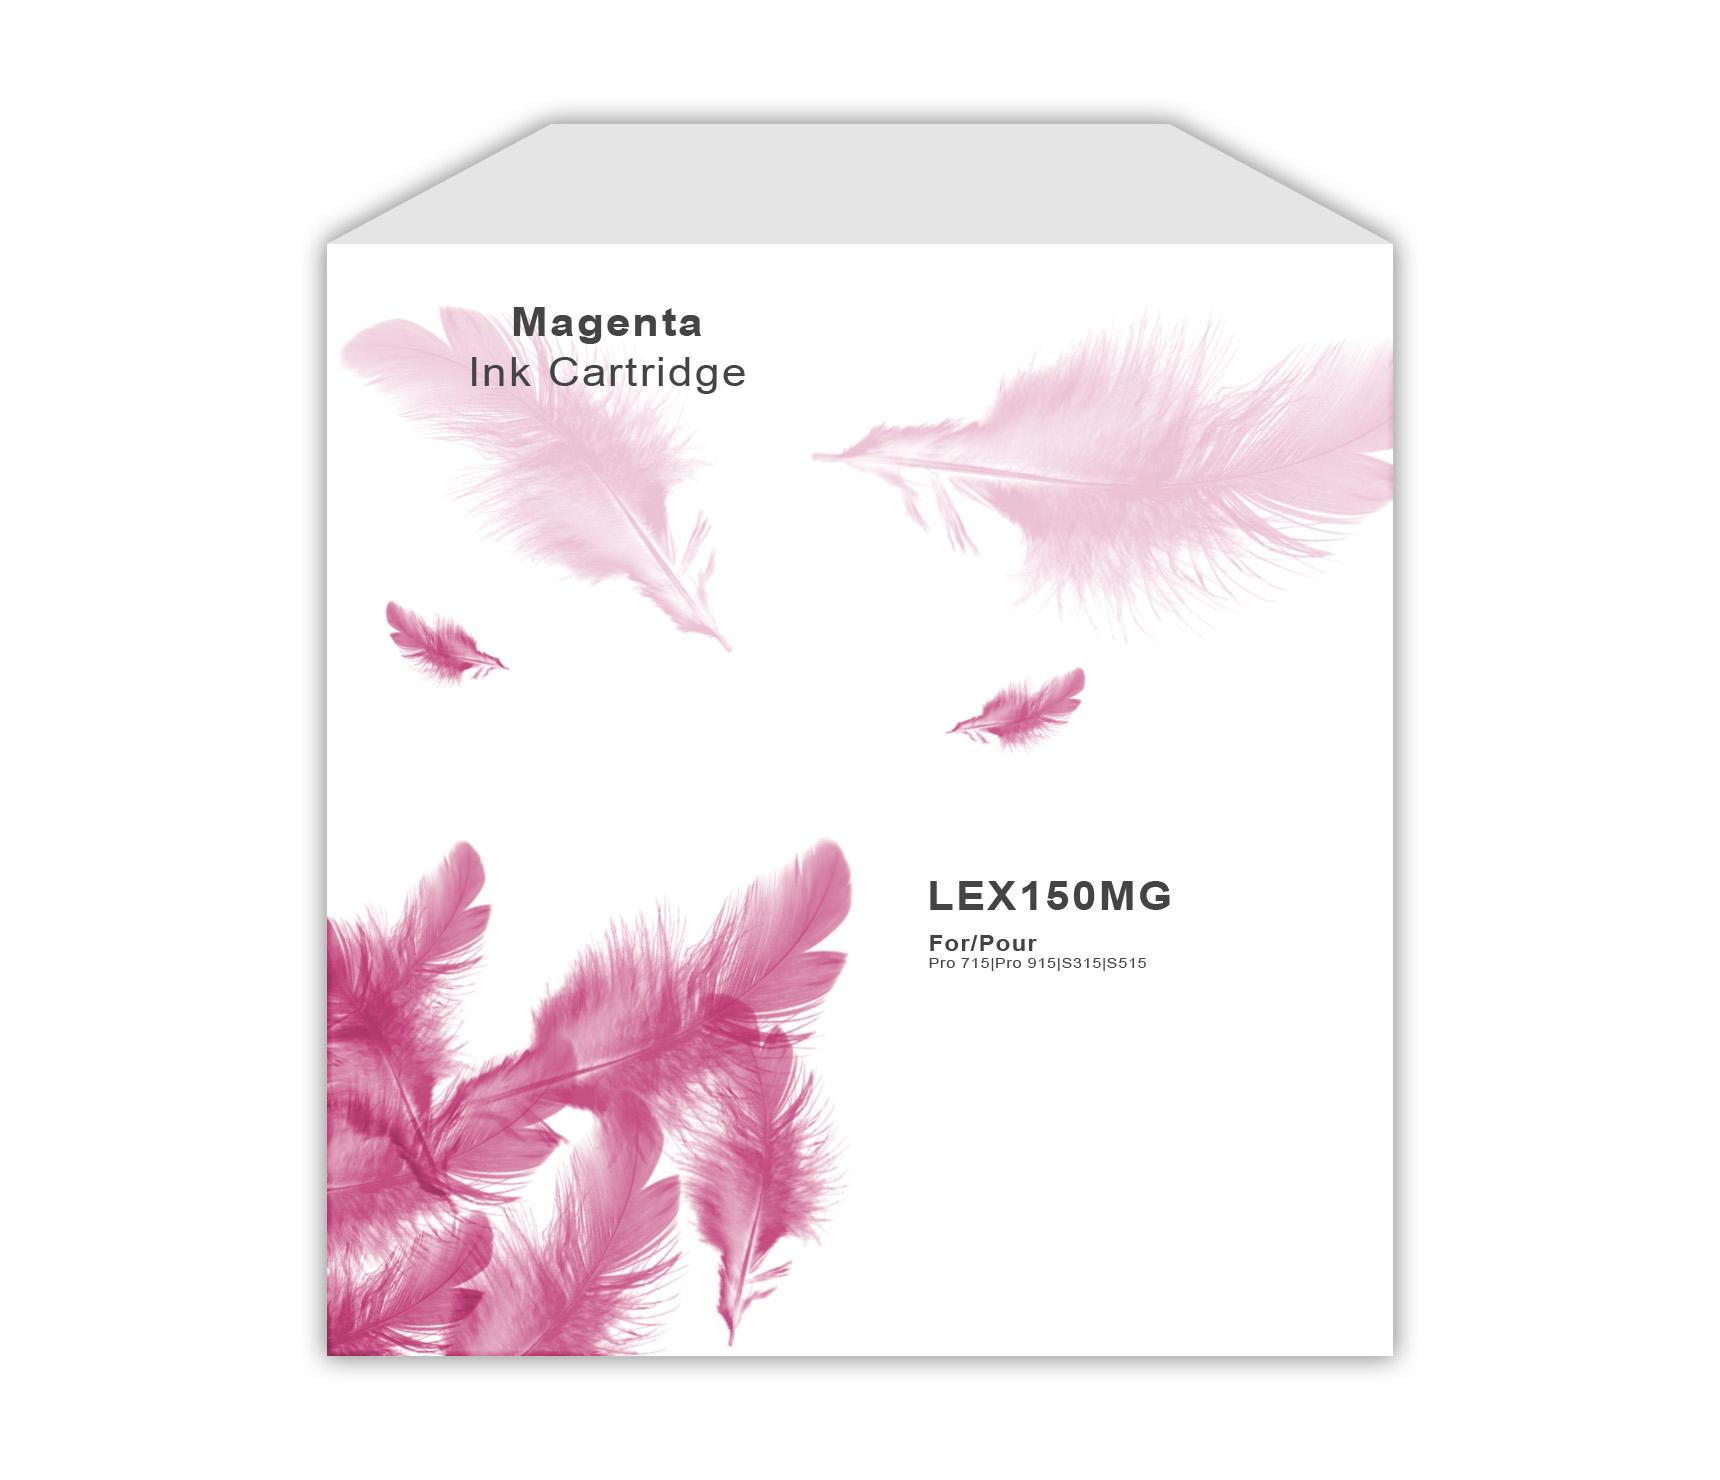 Lexmark 150 Magenta Ink Cartridge